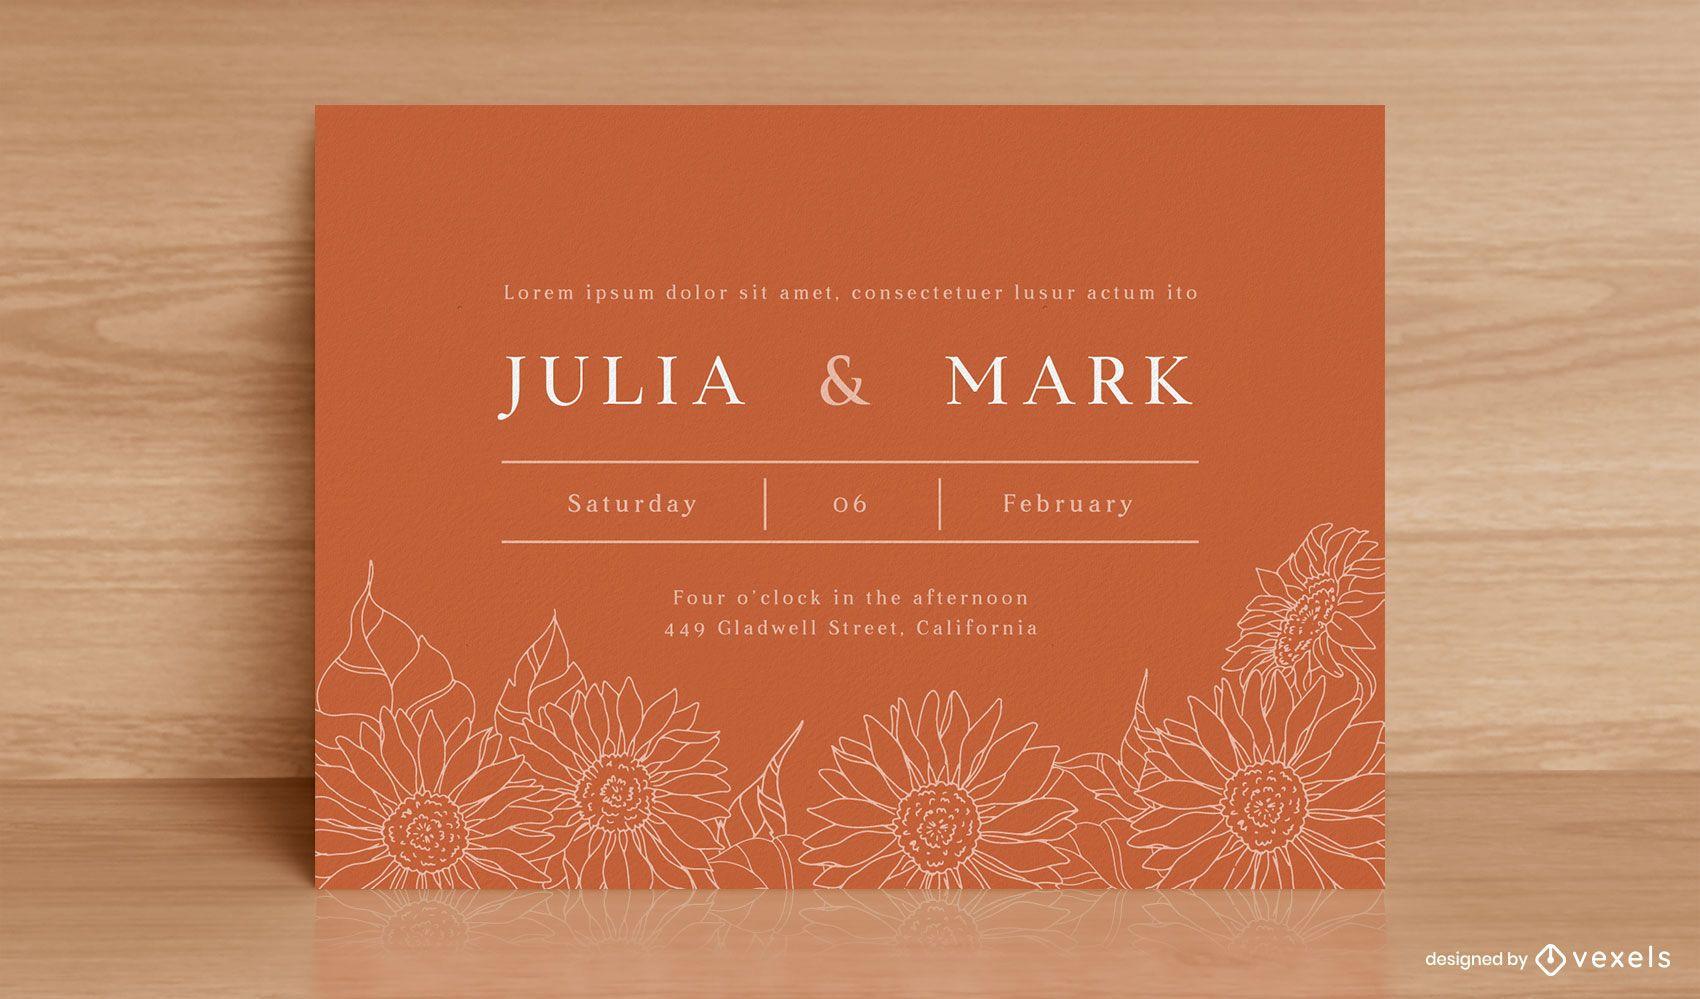 Diseño de invitación de boda de girasoles de arte lineal